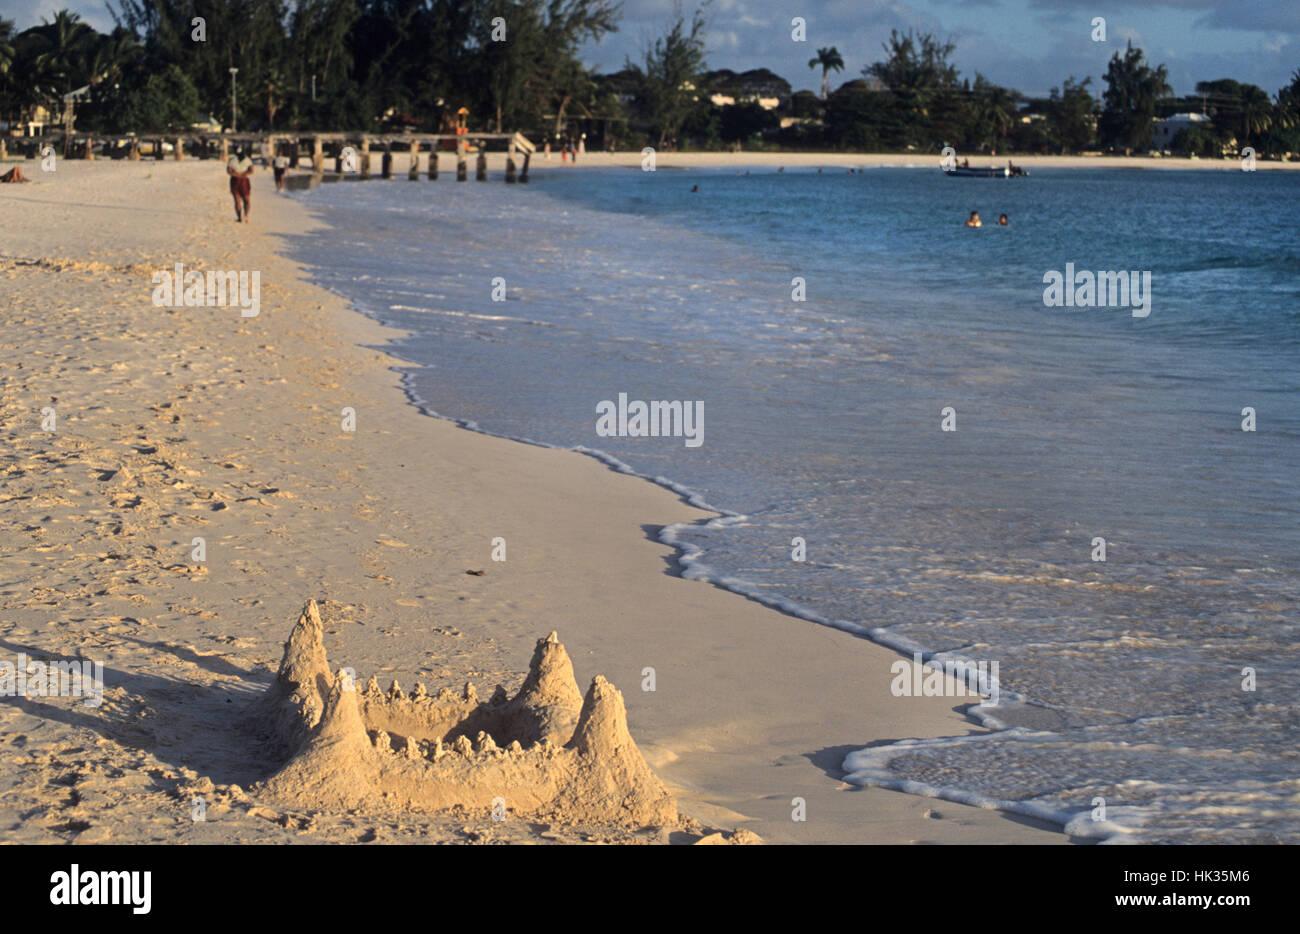 Sand Castle, Boatyard beach, Barbados, Caribbean - Stock Image